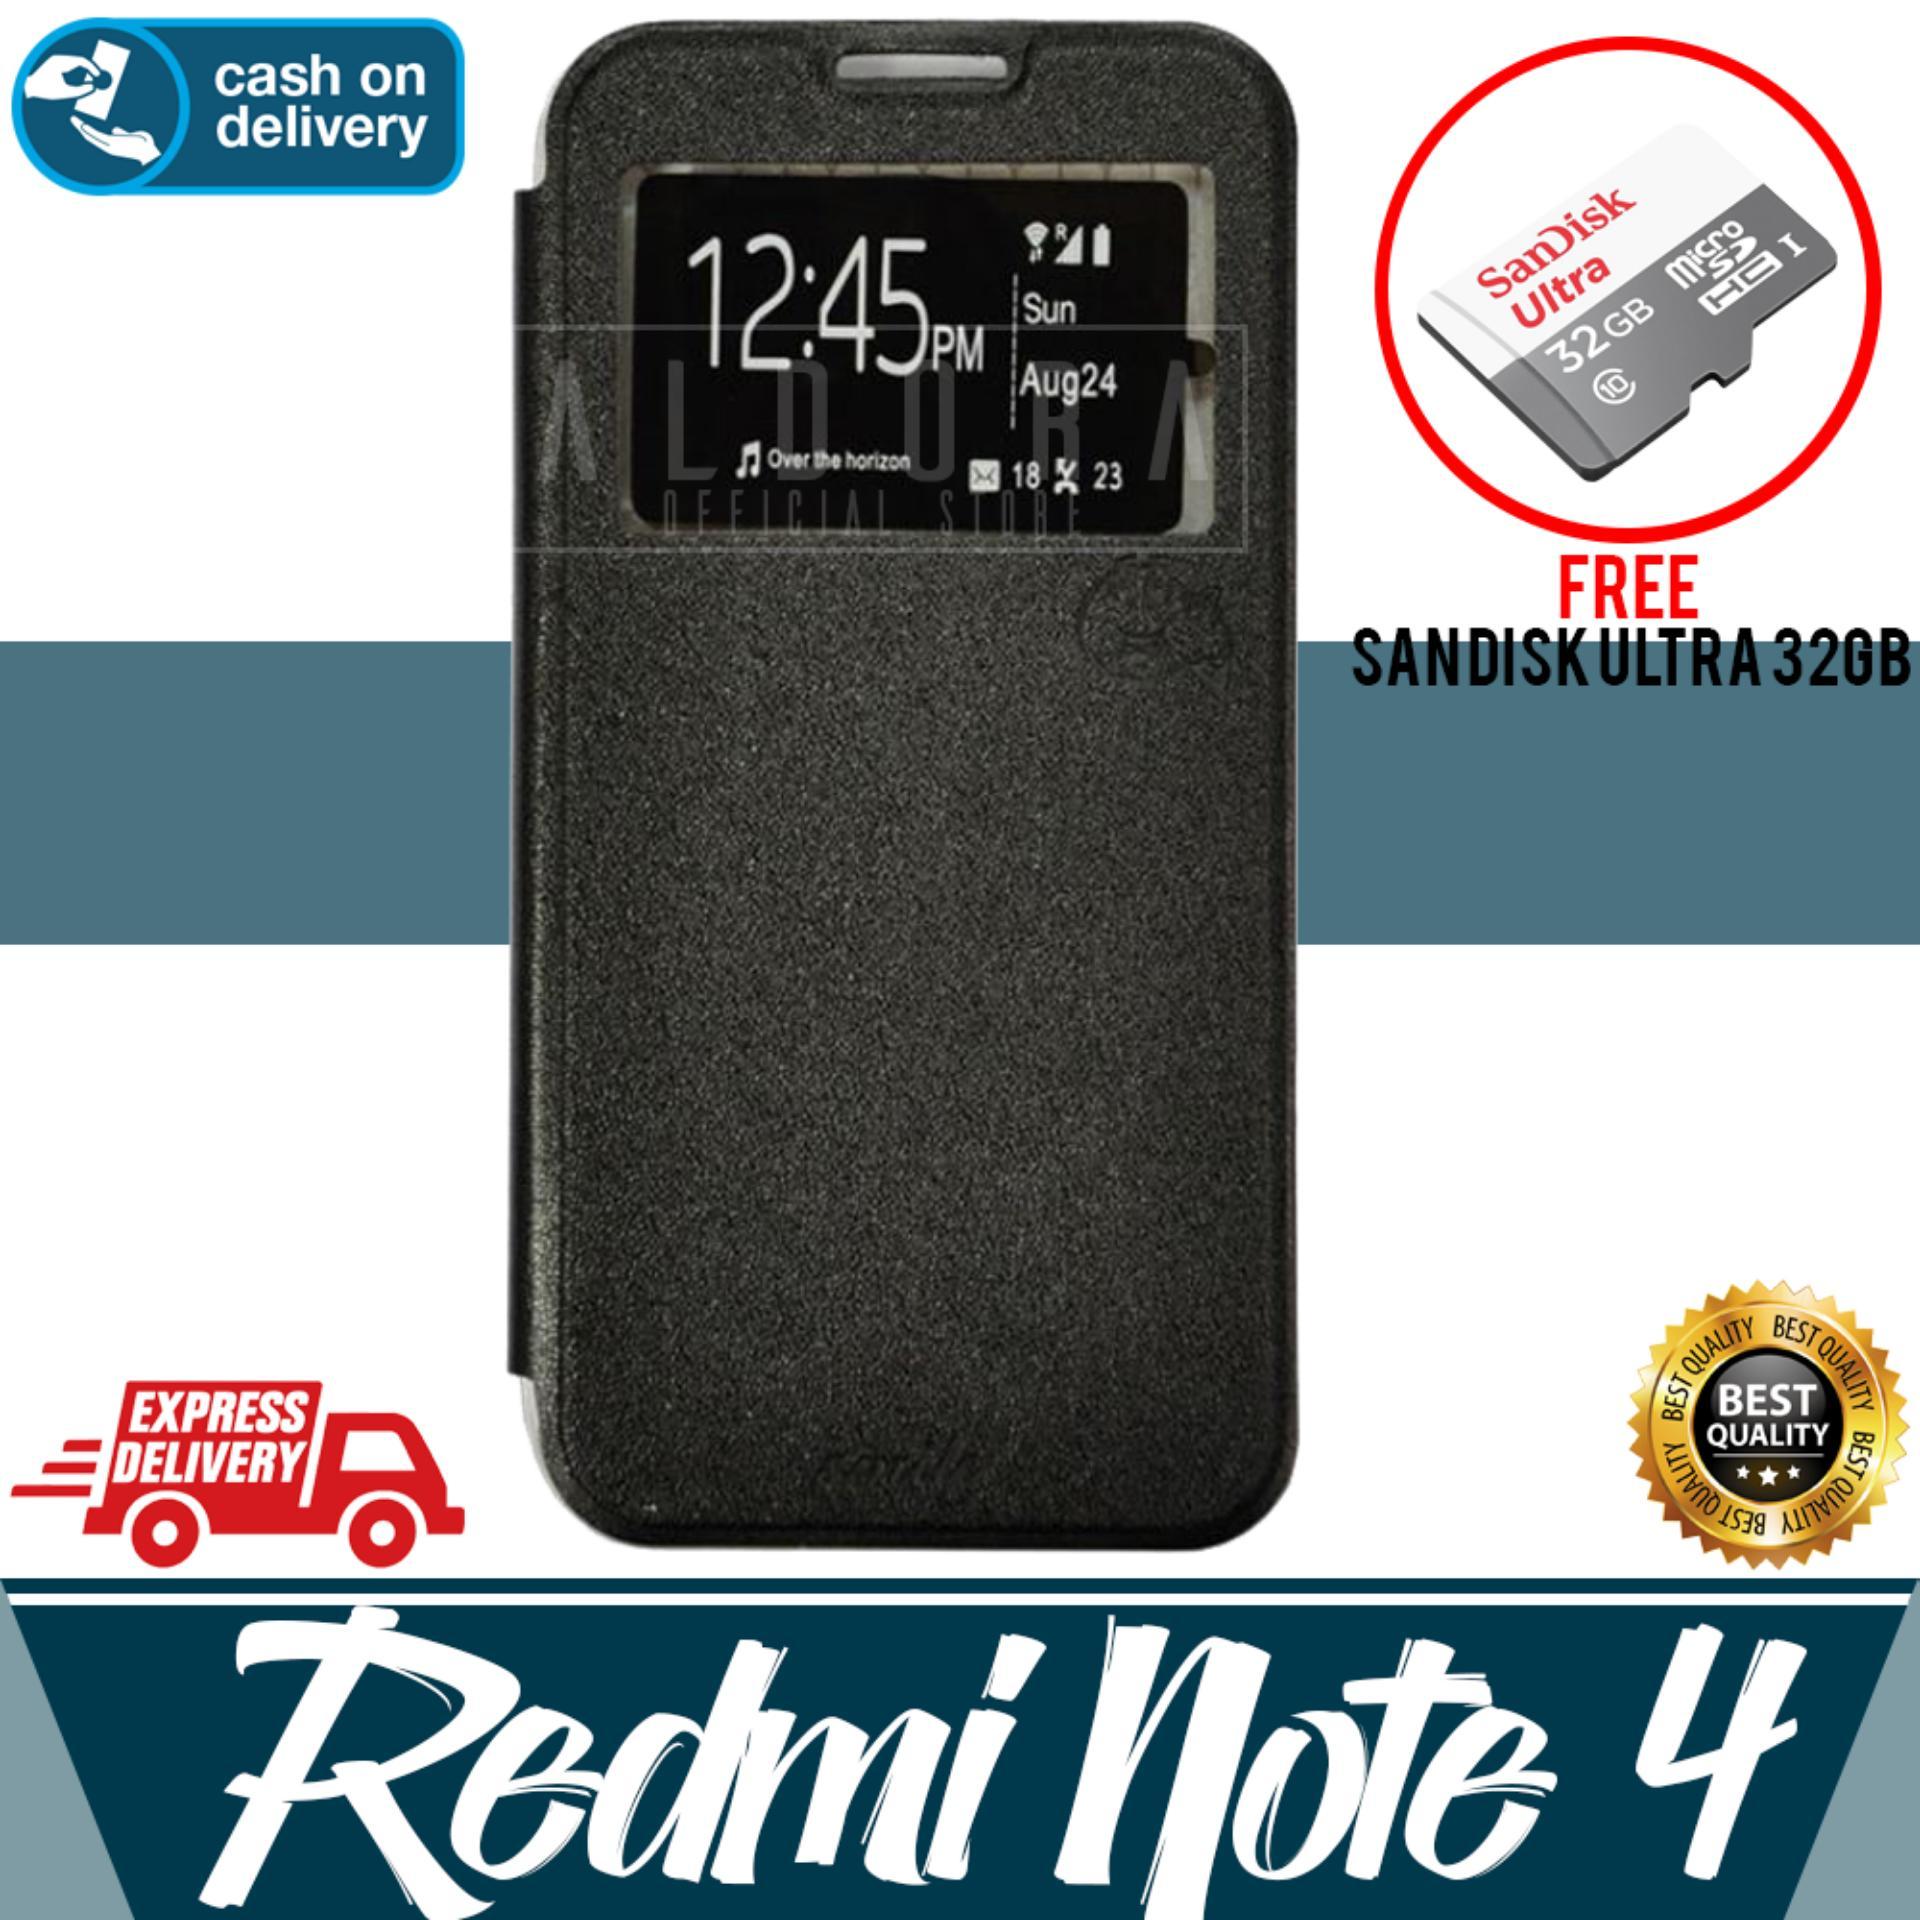 Aldora Case For Xiaomi Redmi Note 4X (Mediatek & SnapDragon) Flip Cover Case Dengan Pelindung Layar Smile Series - Hitam Free Memory Card SanDisk 32GB